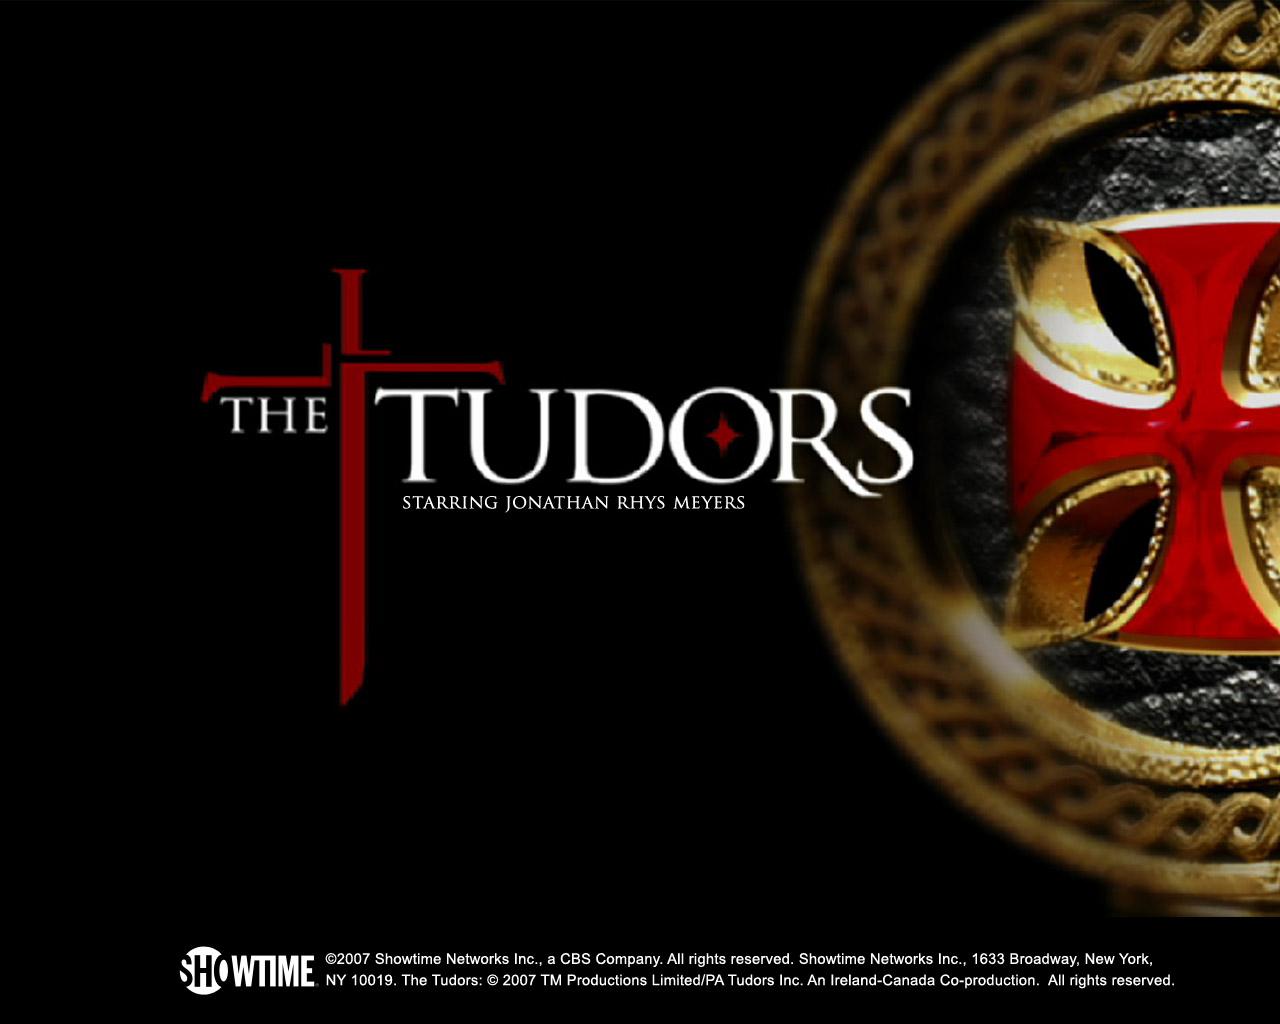 http://1.bp.blogspot.com/_9INbyr217Jc/TSbJxSU_RaI/AAAAAAAAAXk/nRQciG8YGLU/s1600/Movies_Films_T_The_Tudors_010661_.jpg